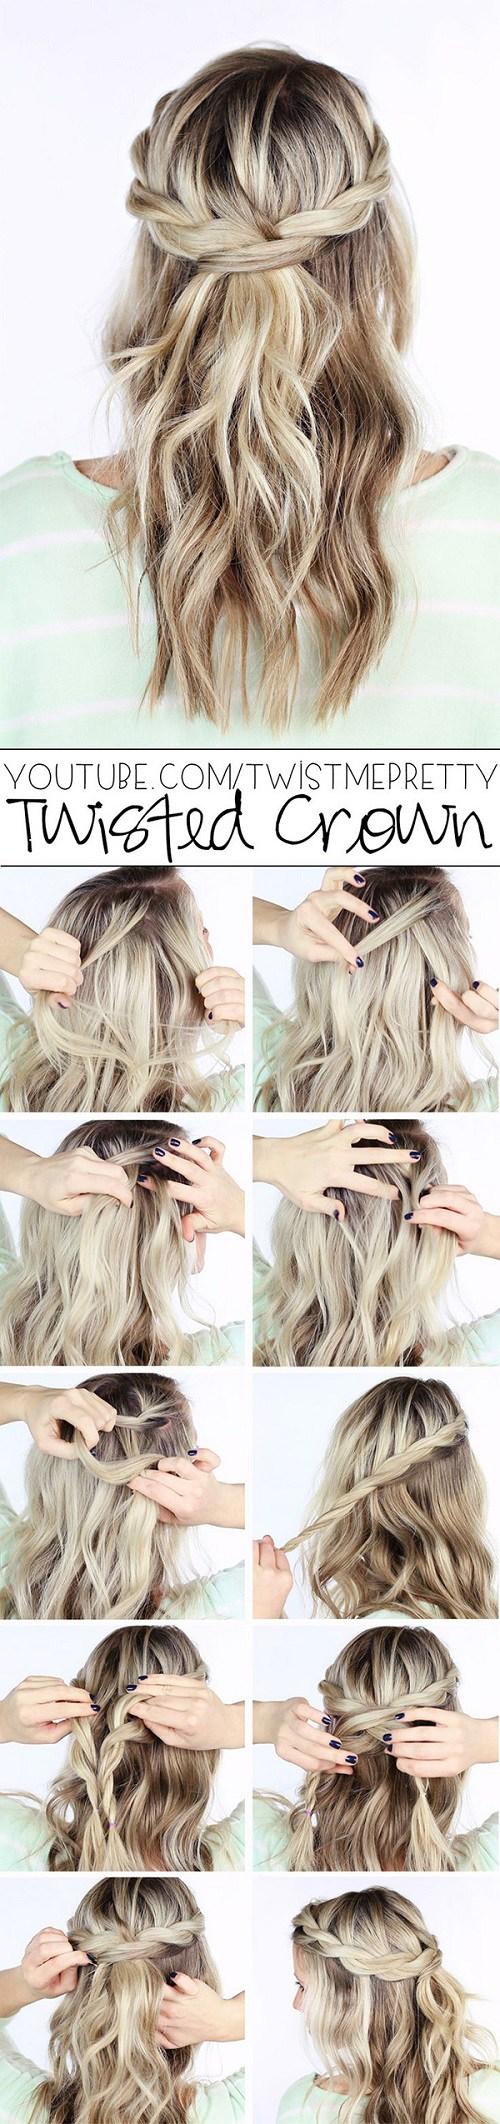 20 Simple Hair Tutorials for Medium and Long Hair